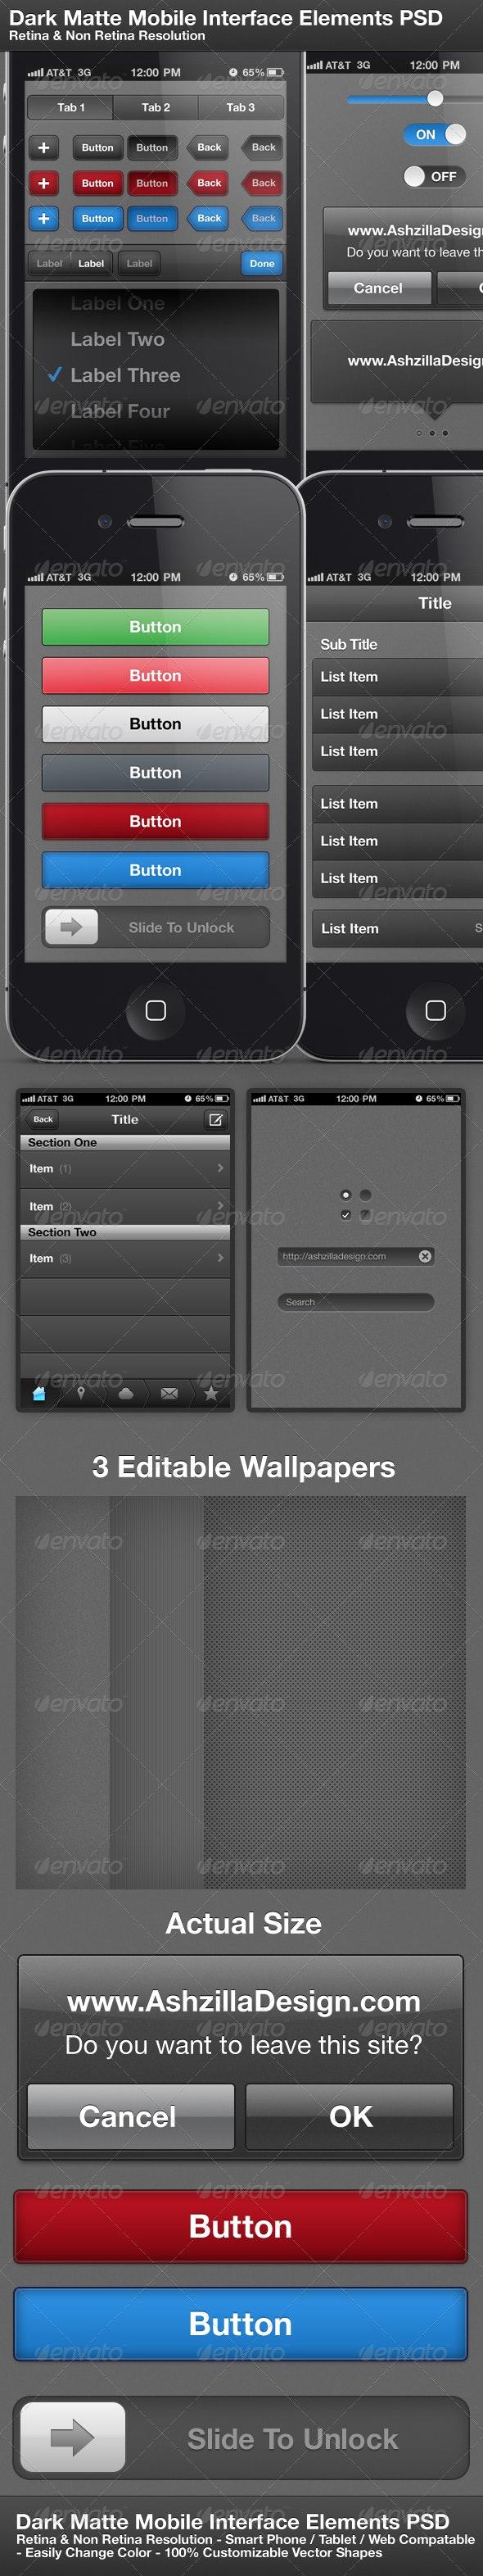 Dark Matte Mobile Interface Elements PSD